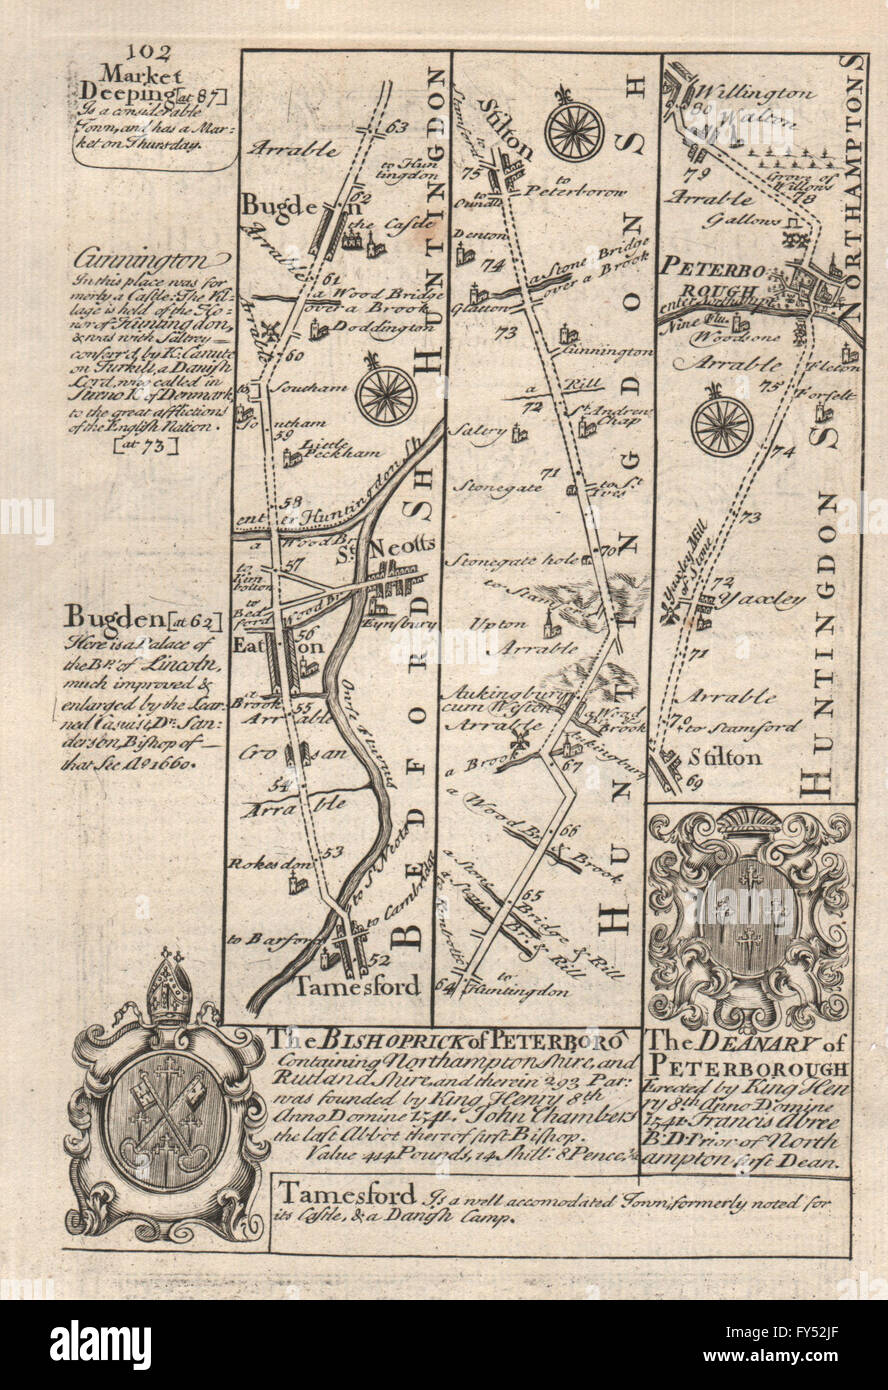 Europe Maps Royston-arrington-caxton-huntingdon-stilton Road Map By Owen & Bowen 1753